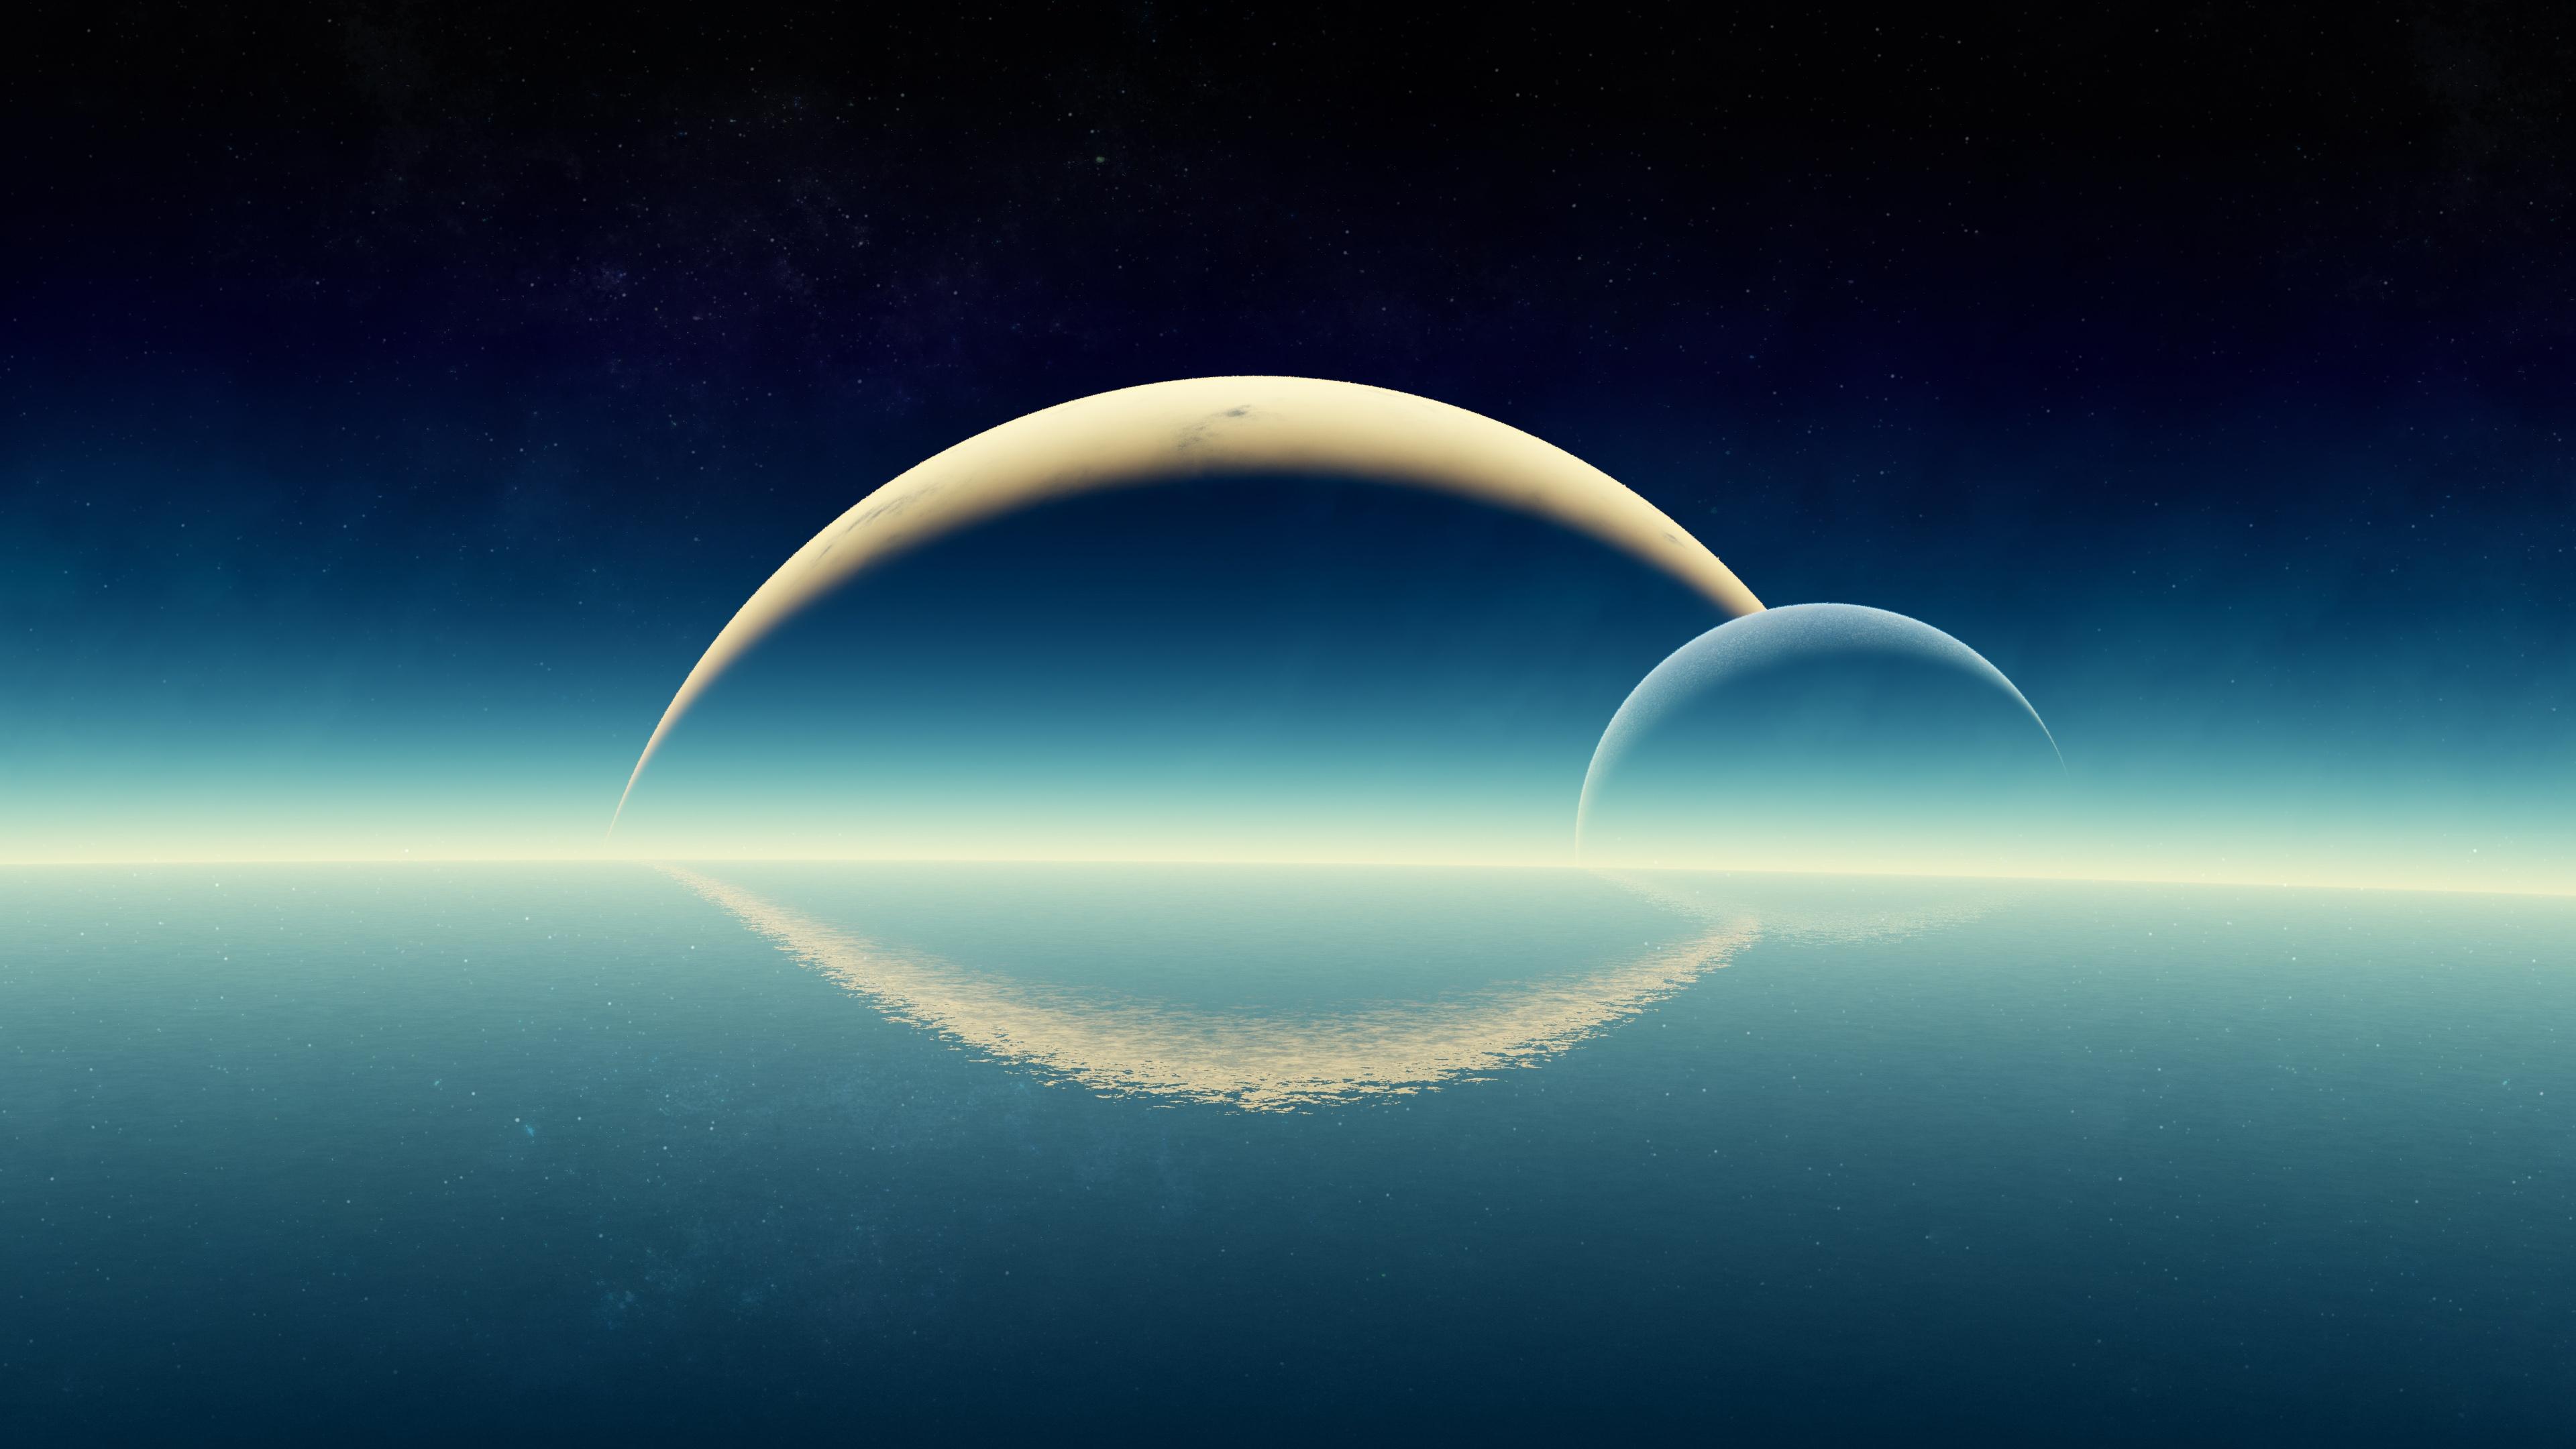 Wallpapers del universo[4k]